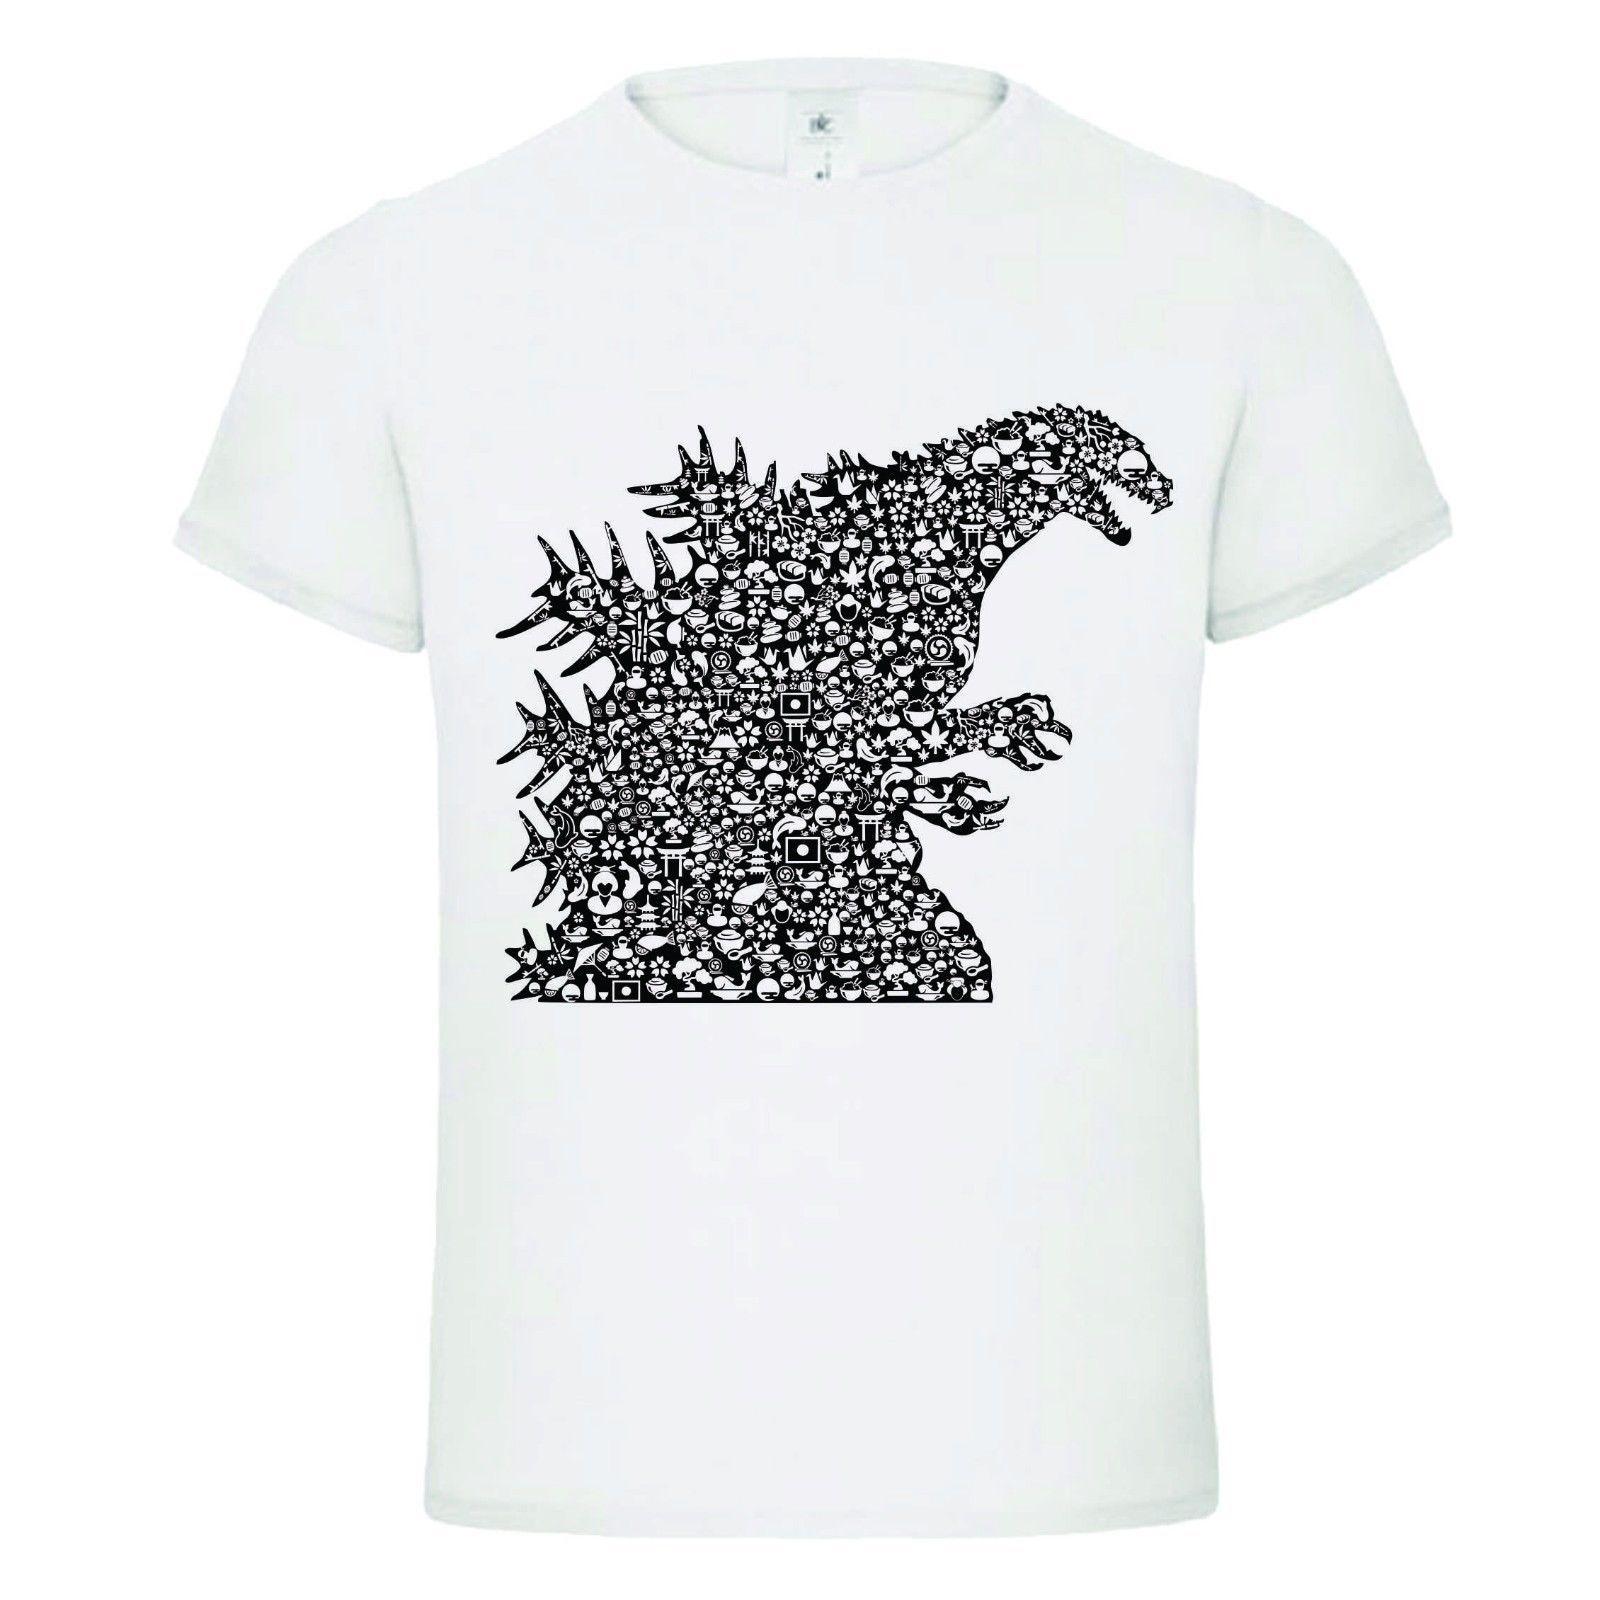 6347d2dea GODZILLA SHAPES MASHUP Funny Mens Dtg T Shirt Tee FULL COLOR T SHIRT Gift  Print T Shirt,Hip Hop Tee Shirt,NEW ARRIVAL Tees Awesome Tee Shirt Funny T  Shirts ...